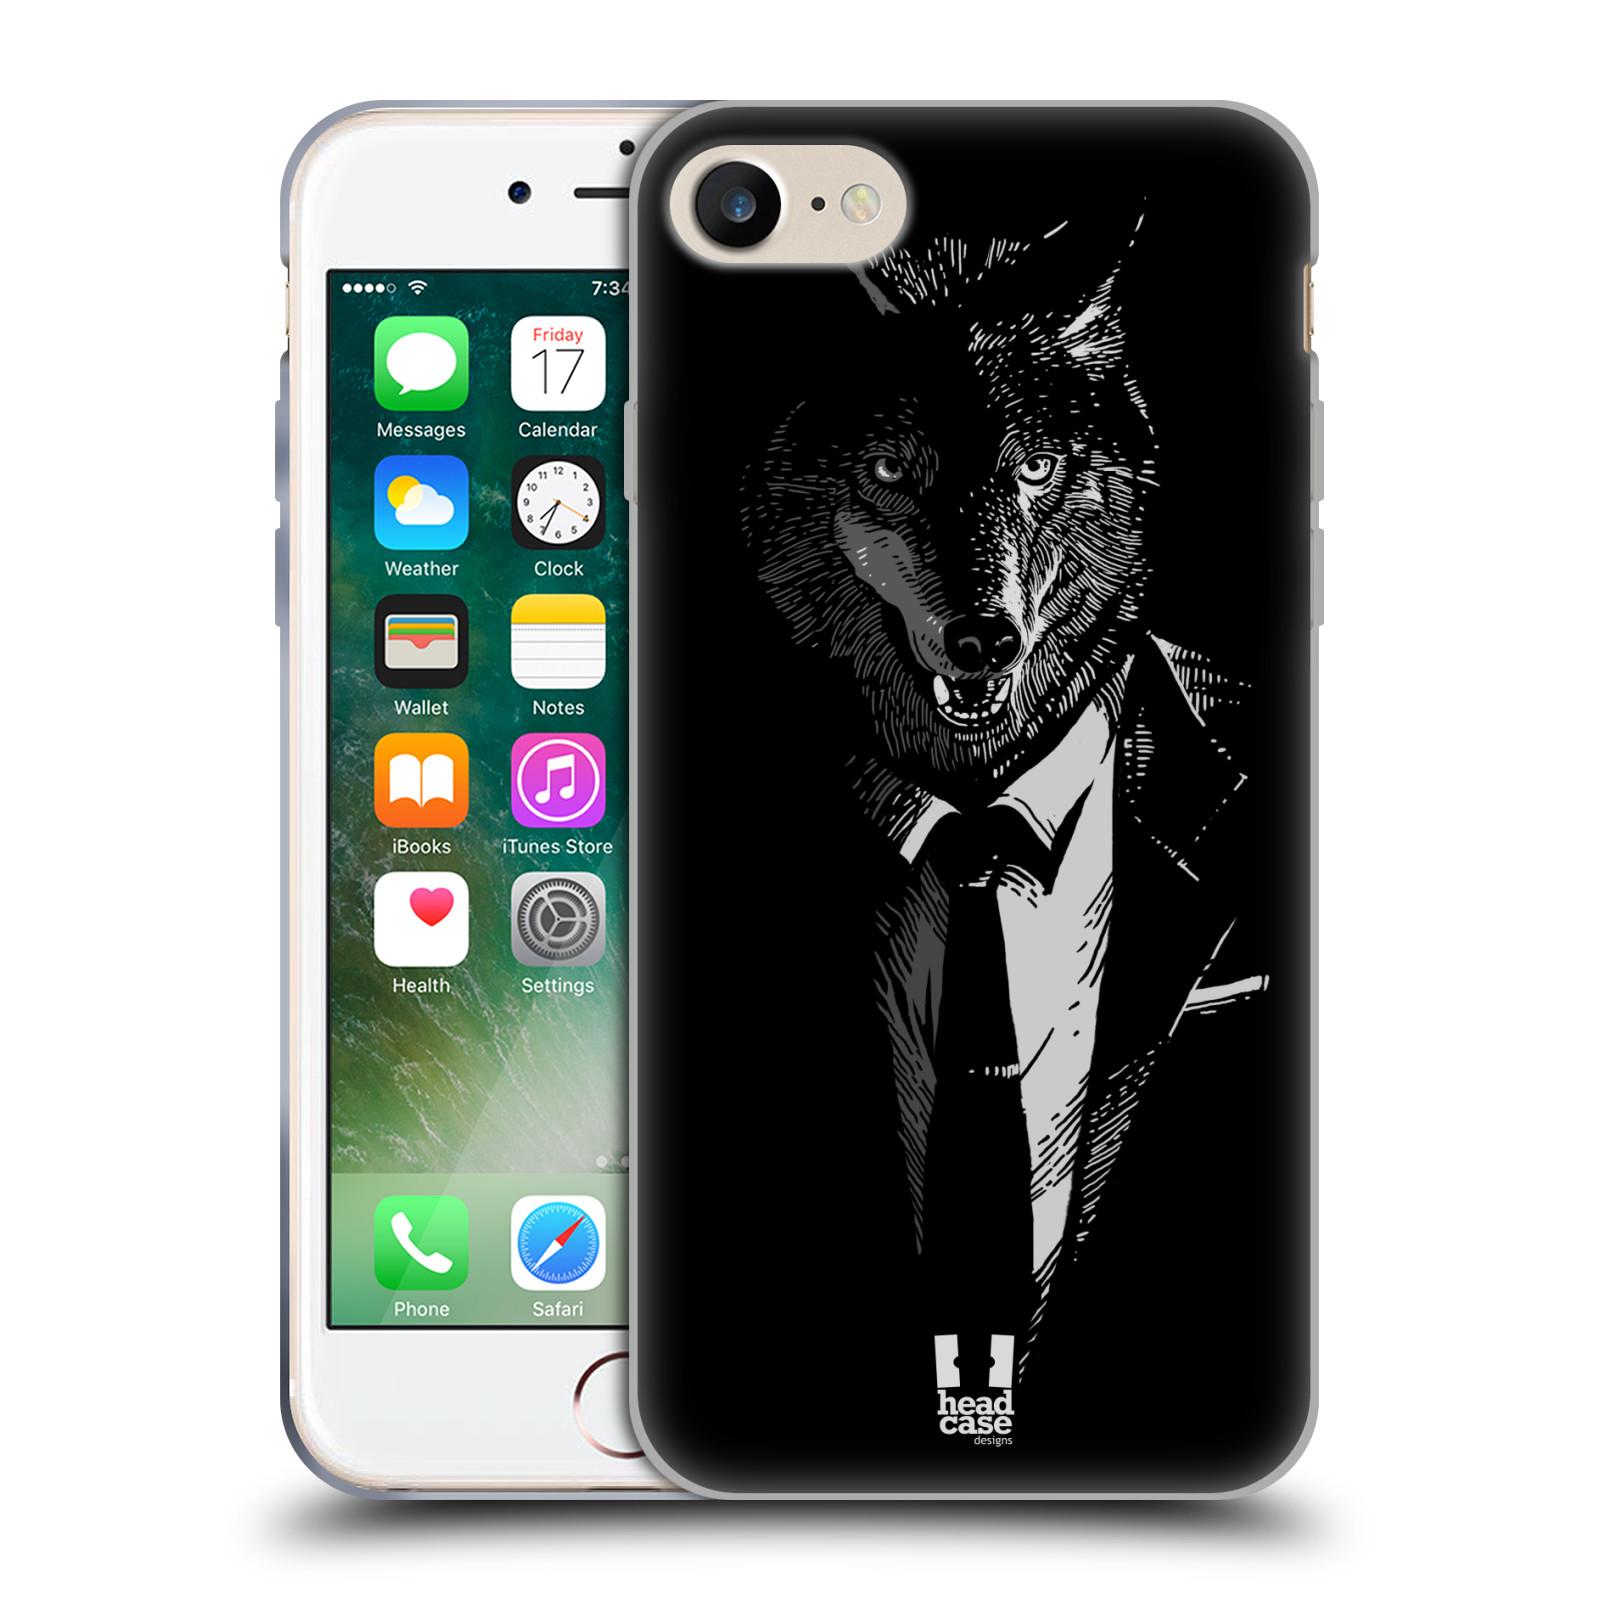 Silikonové pouzdro na mobil Apple iPhone 8 - Head Case - VLK V KVÁDRU (Silikonový kryt či obal na mobilní telefon Apple iPhone 8 s motivem VLK V KVÁDRU)